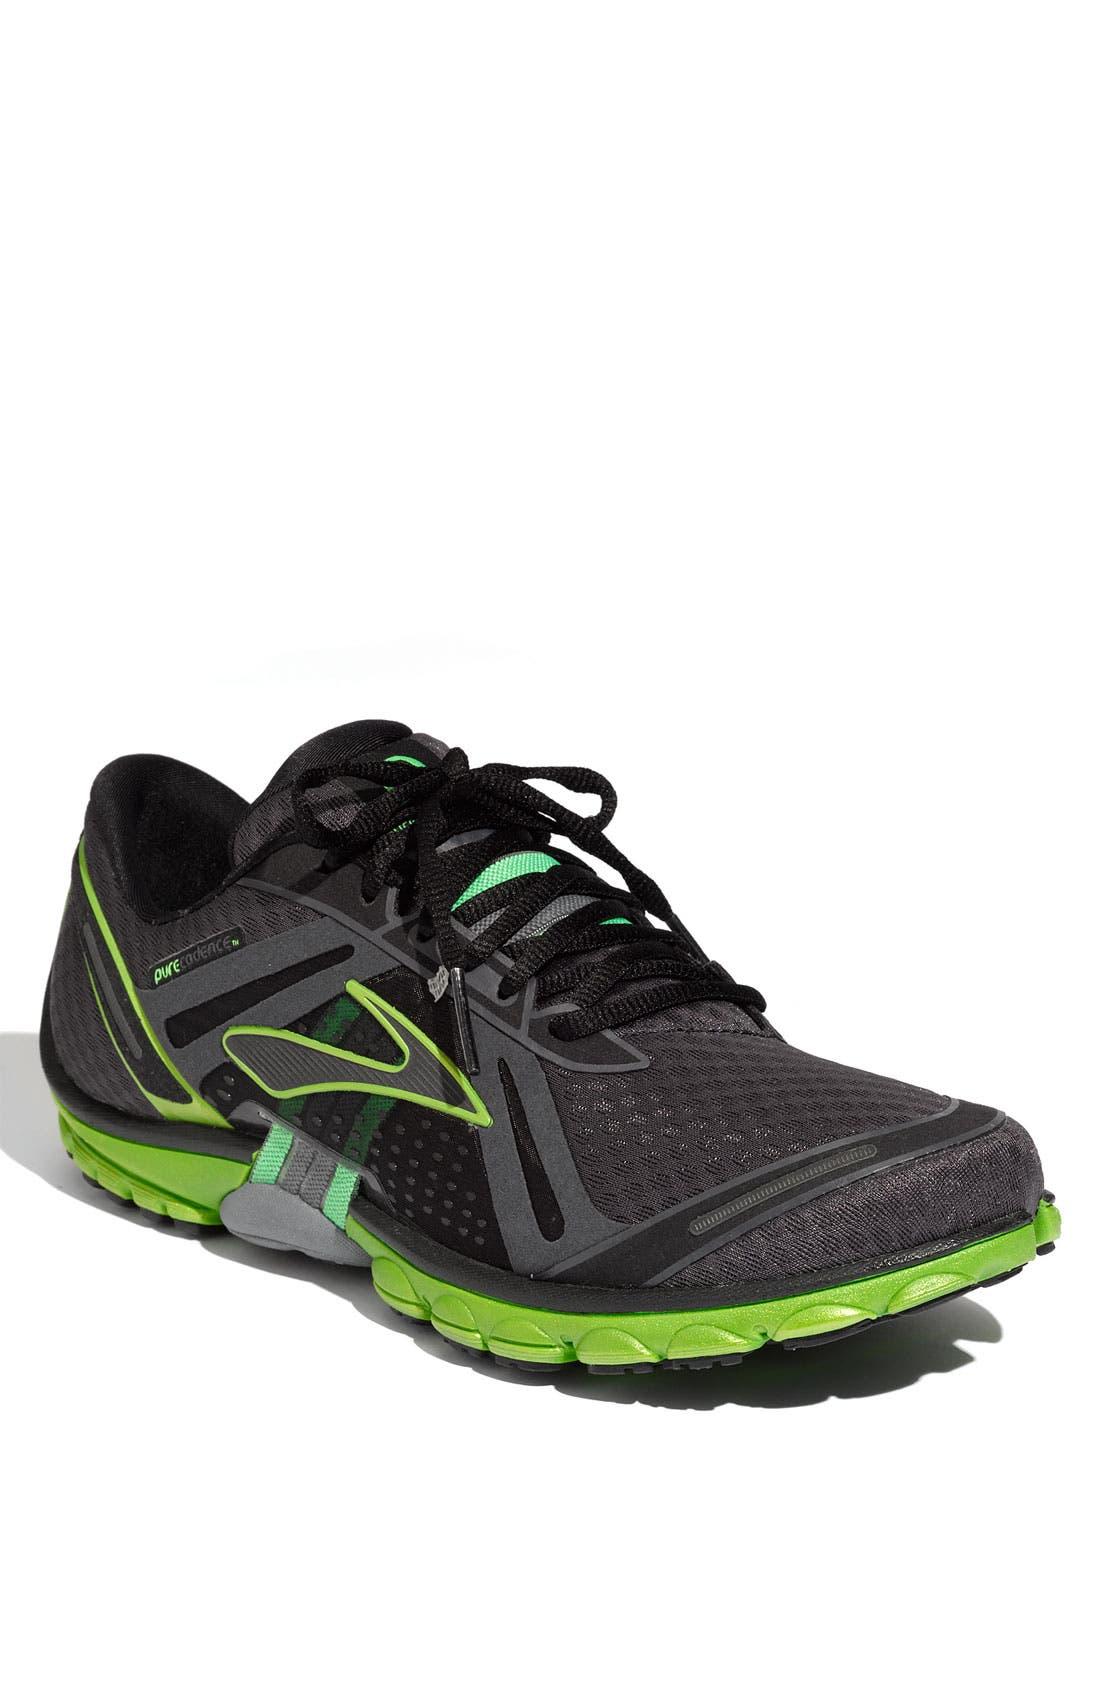 Alternate Image 1 Selected - Brooks 'PureCadence' Running Shoe (Men)